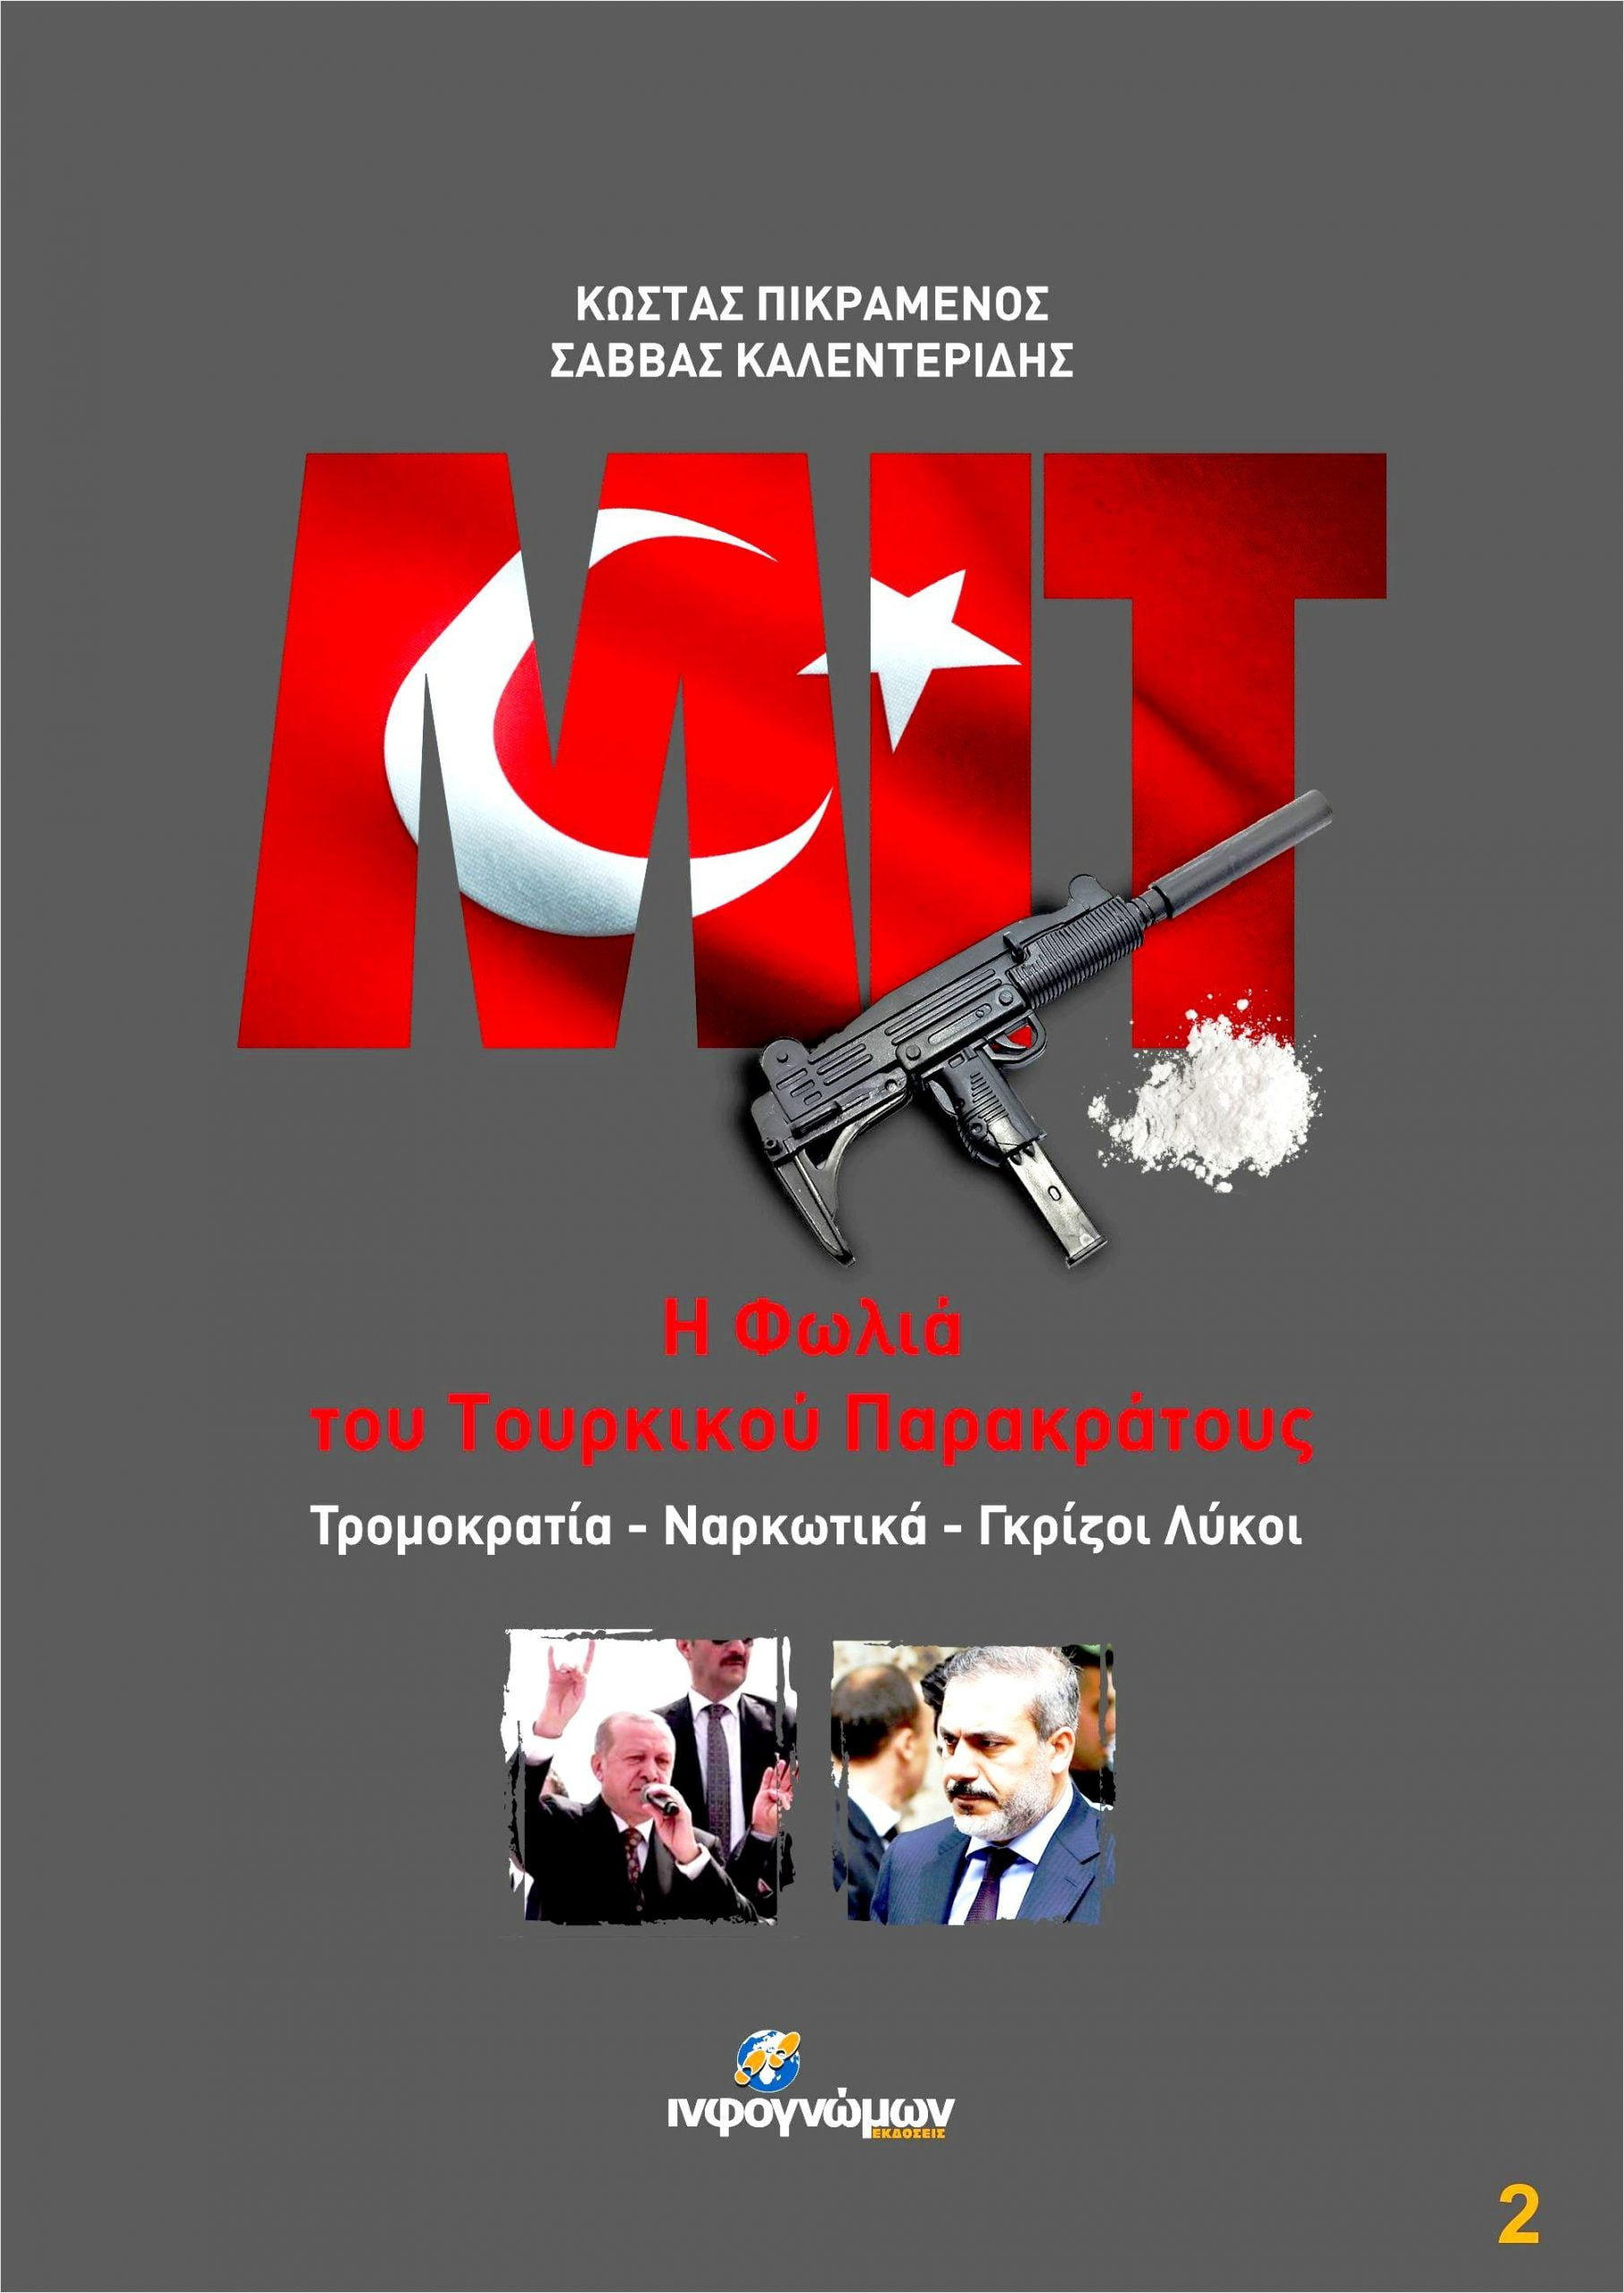 Kώστας Πικραμένος – Σάββας Καλεντερίδης —  ΜΙΤ – Η φωλιά του Τουρκικού Παρακράτους